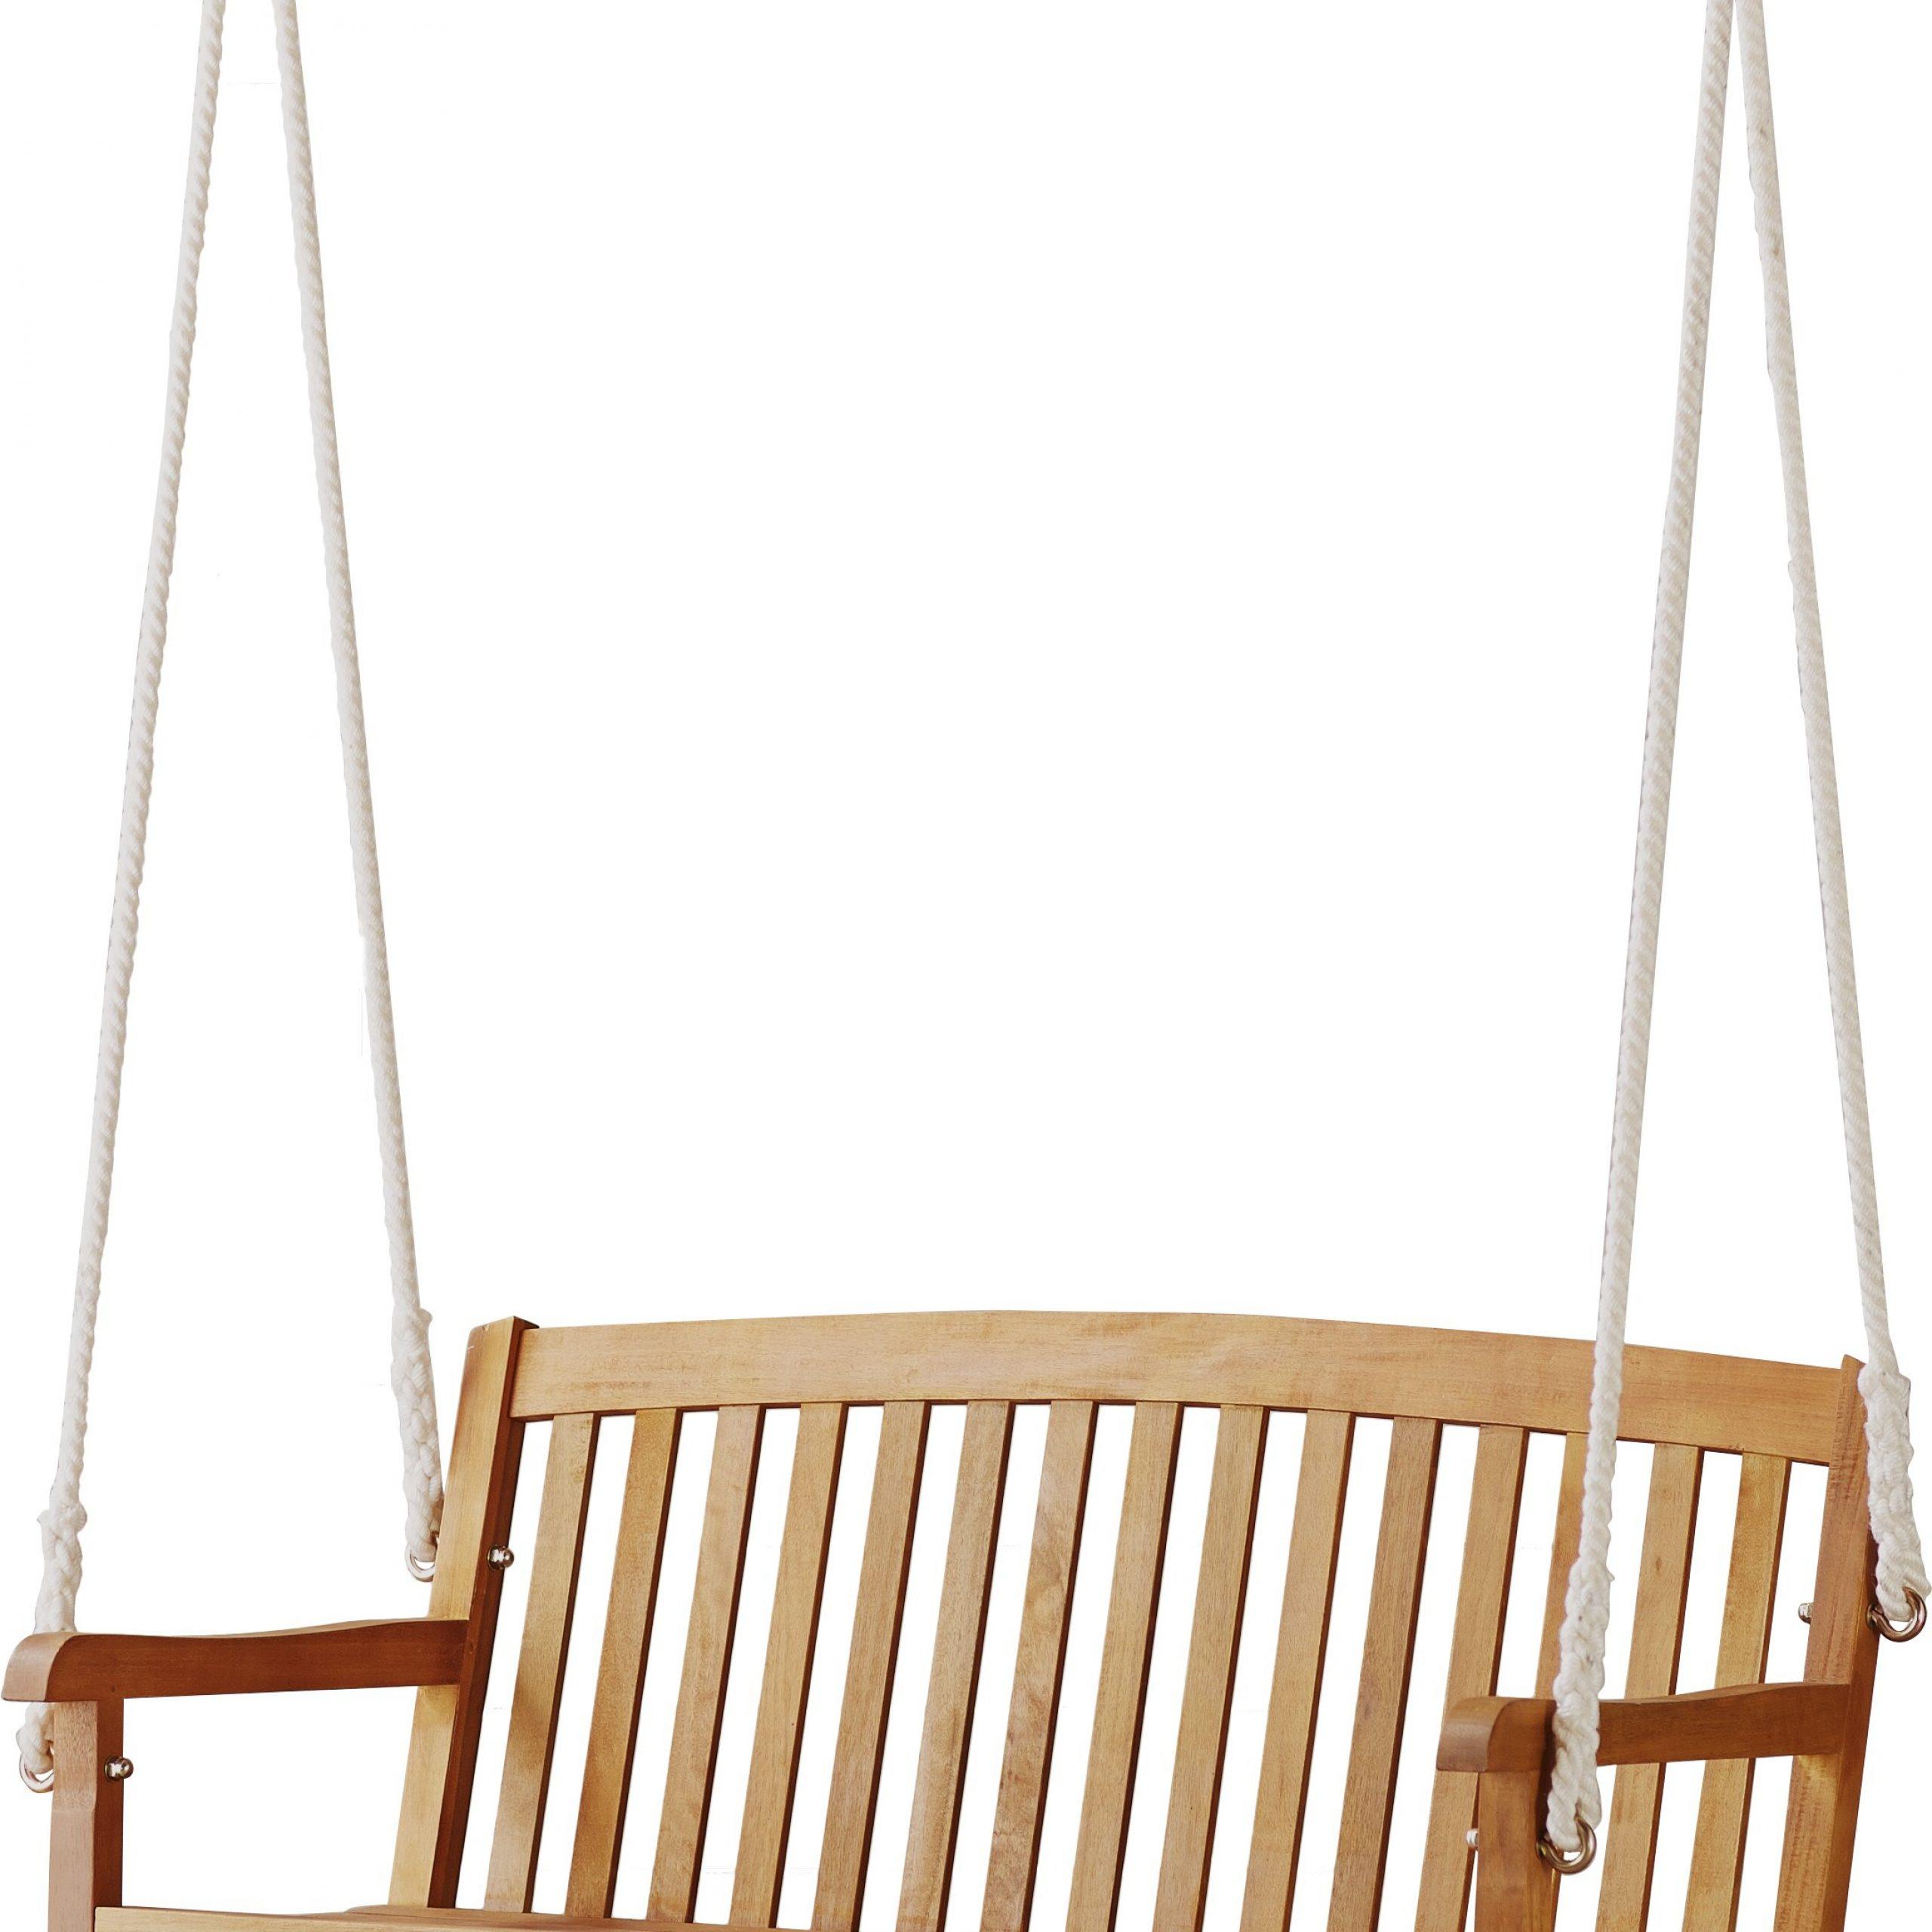 Most Popular Portland Teak Porch Swing For Teak Porch Swings (View 23 of 25)